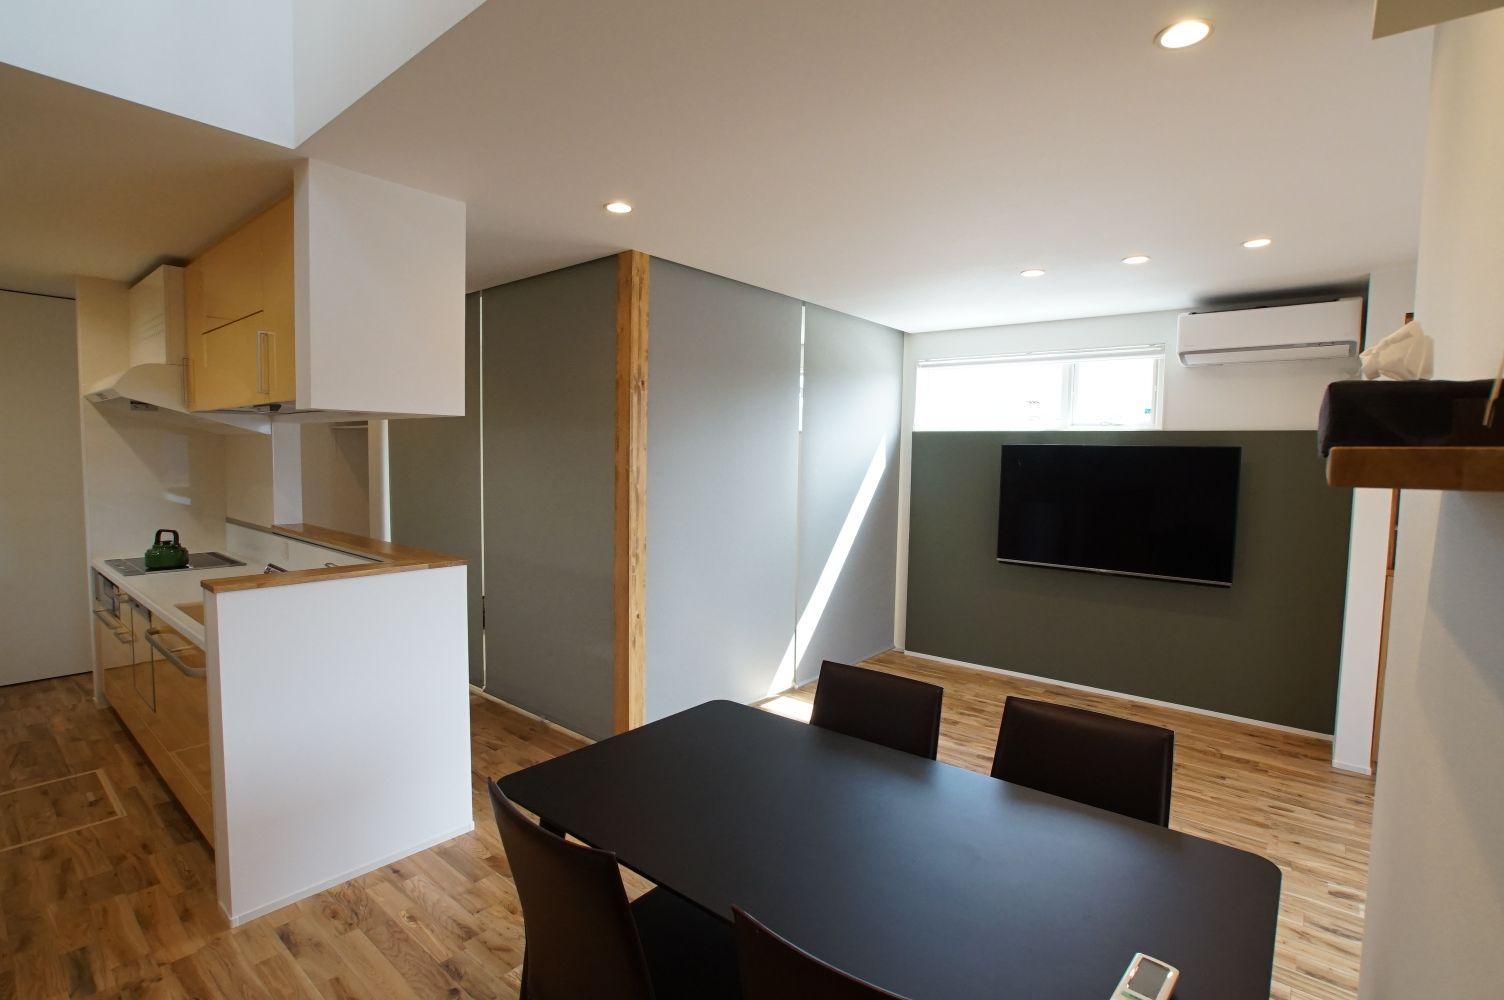 RIKYU (リキュー)【デザイン住宅、省エネ、インテリア】開放的なLDK。吹き抜けから降り注ぐ光がより明るい印象を与えている。